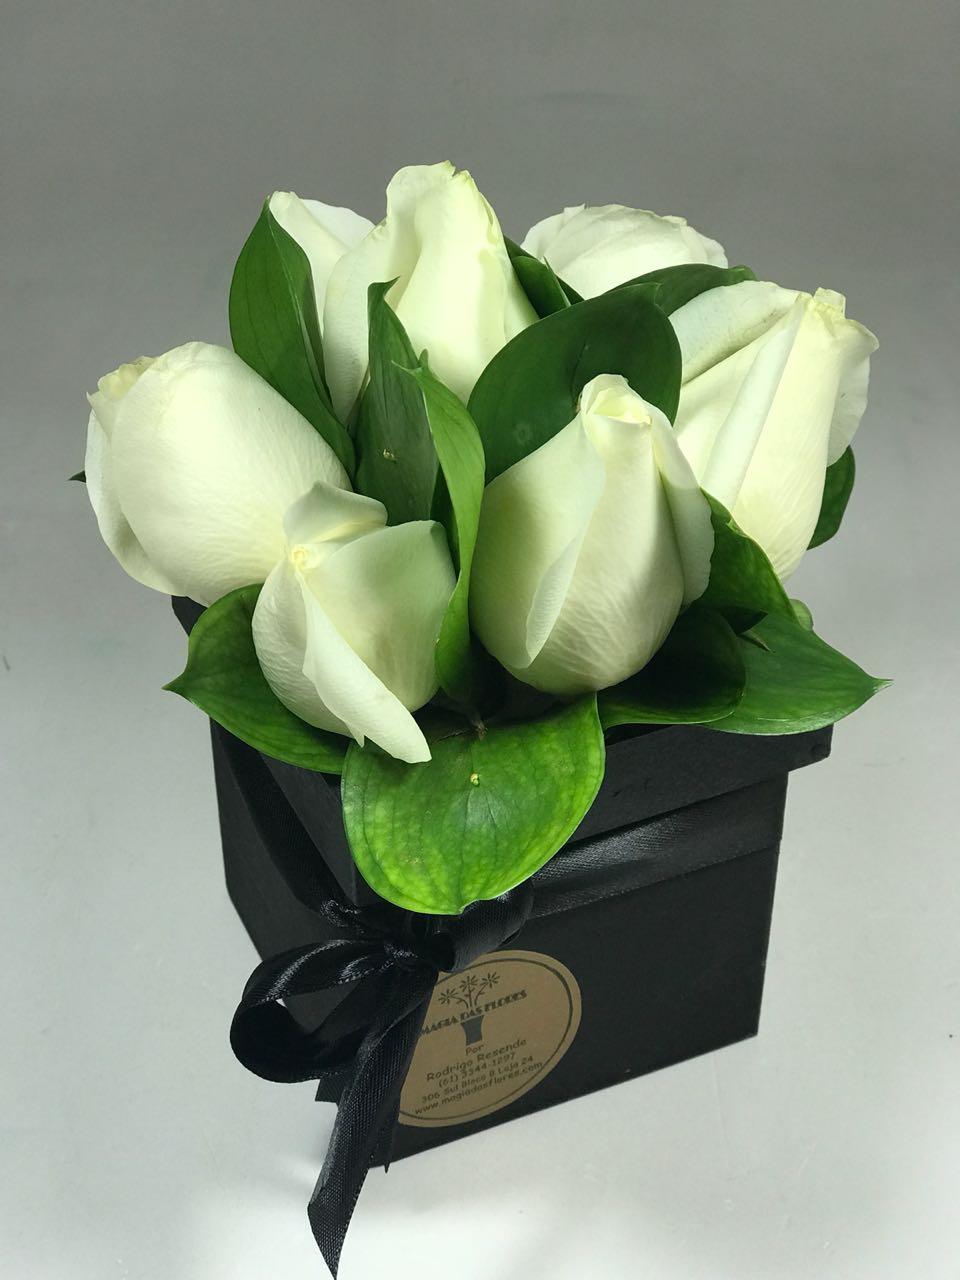 Box de rosas brancas